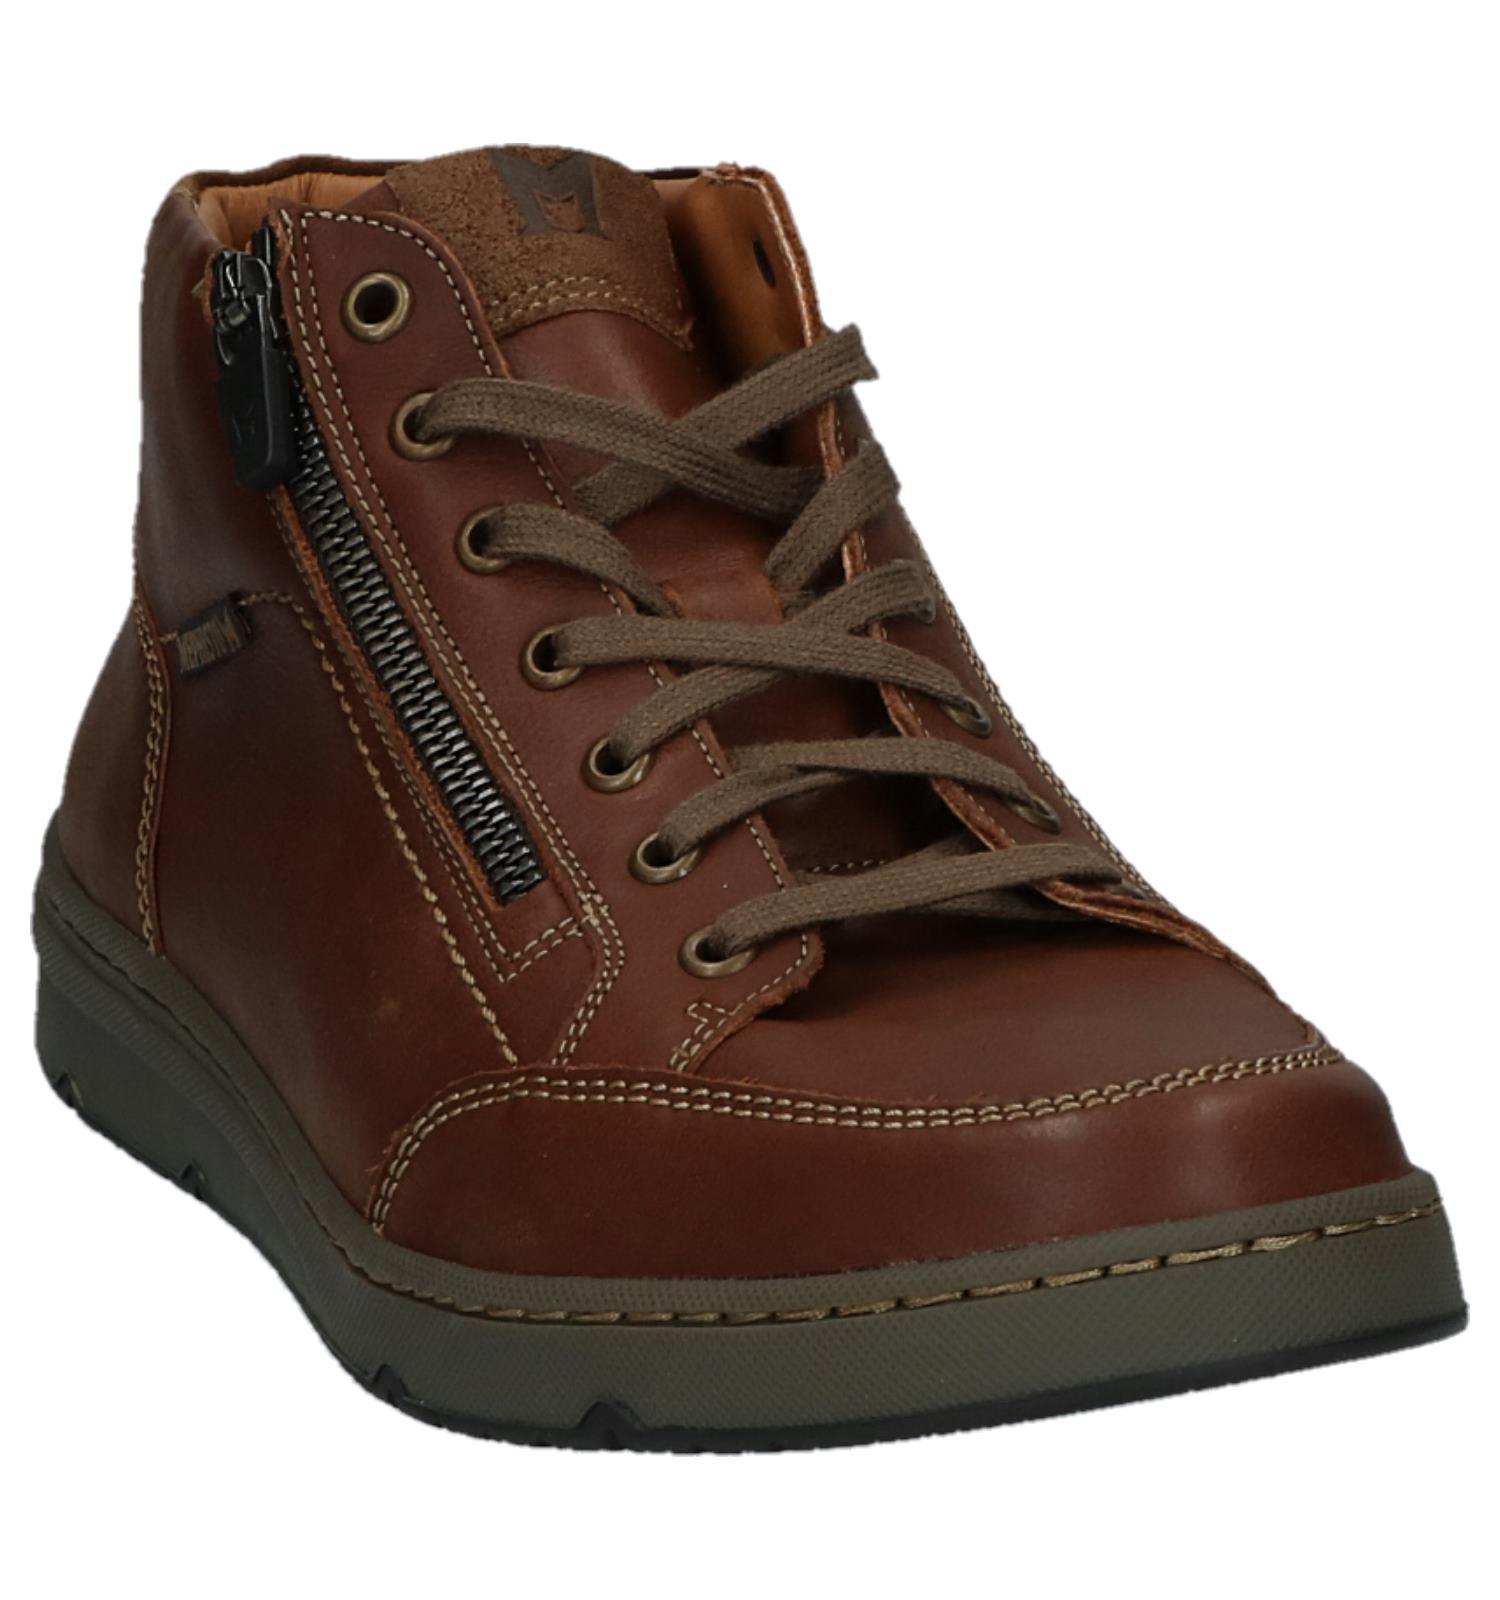 Met Jules Kansas Veters Mephisto Ritsamp; Boots Bruine OwXnP80k